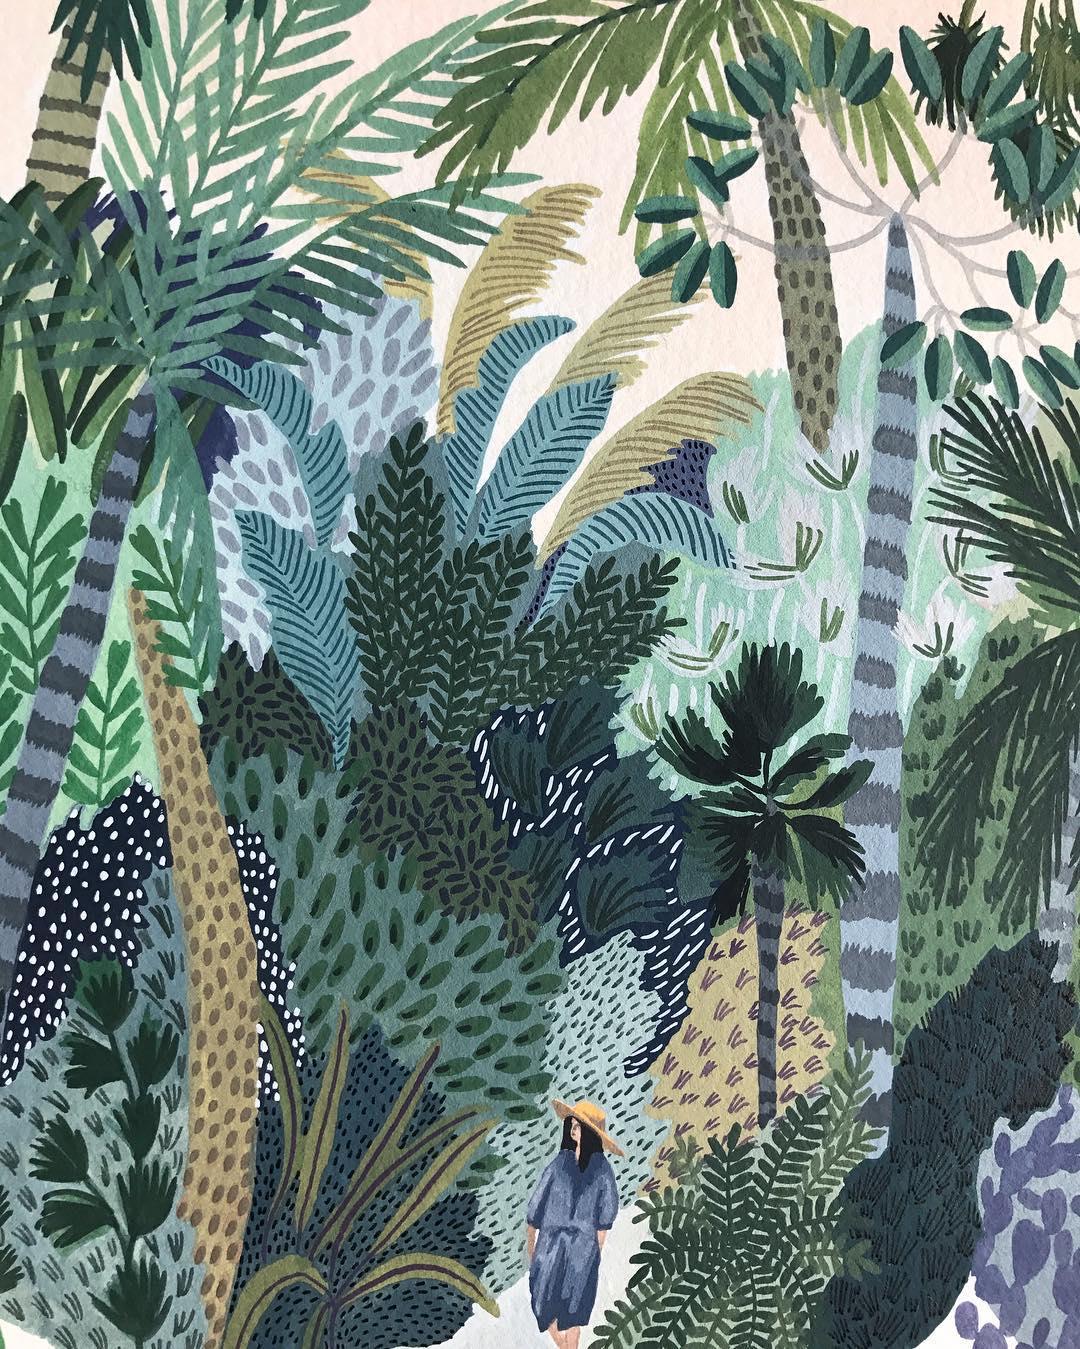 Summer illustrations by Angela McKay